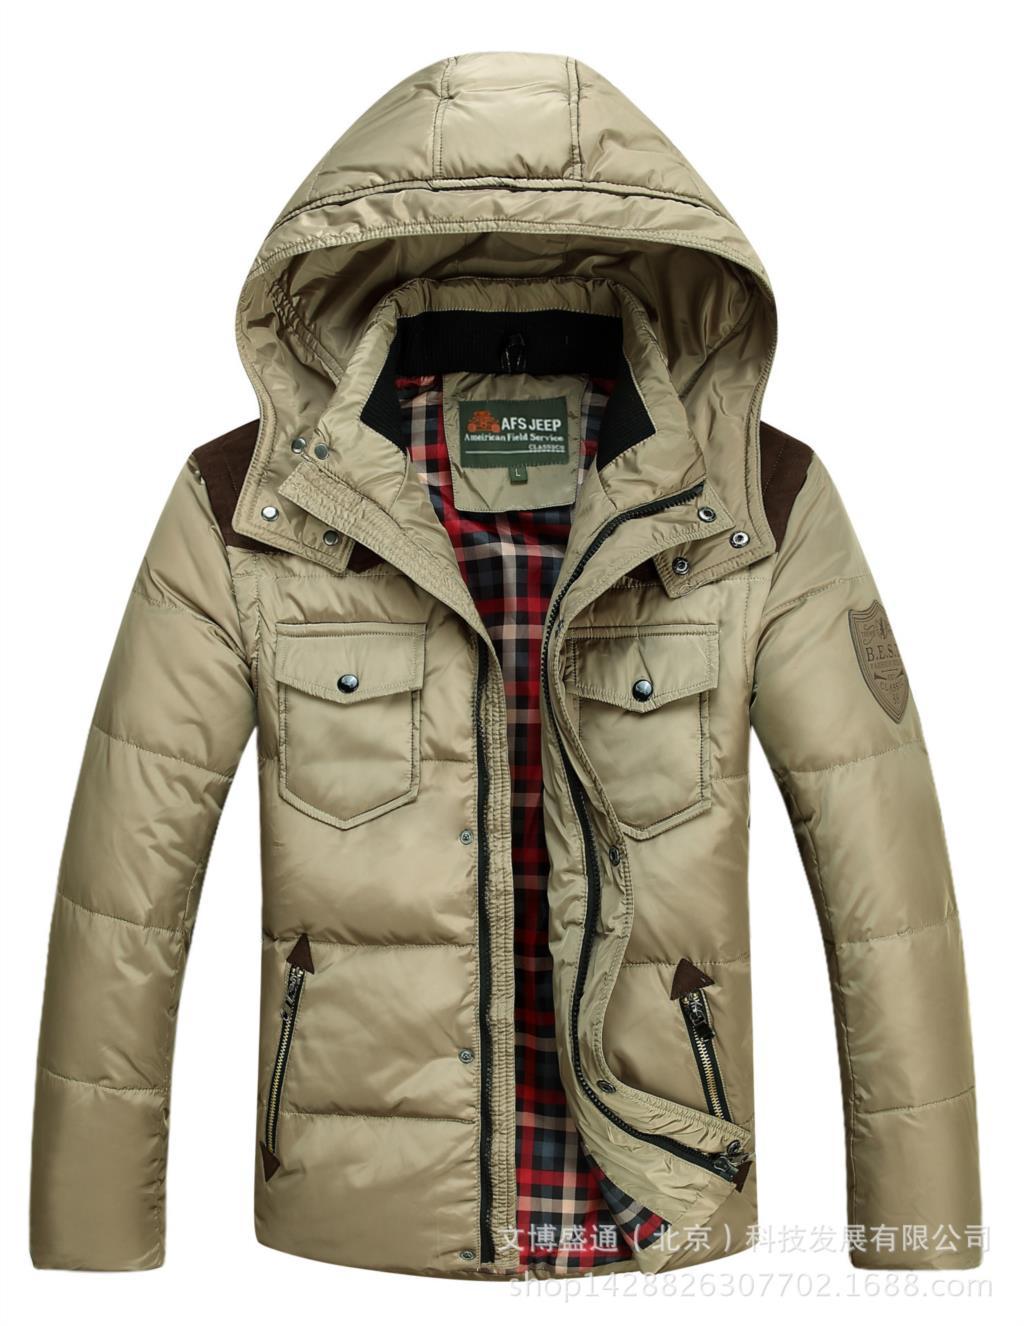 Winter men s long design down jackets coats men fashion thick warm hooded jacket jaqueta masculina mens